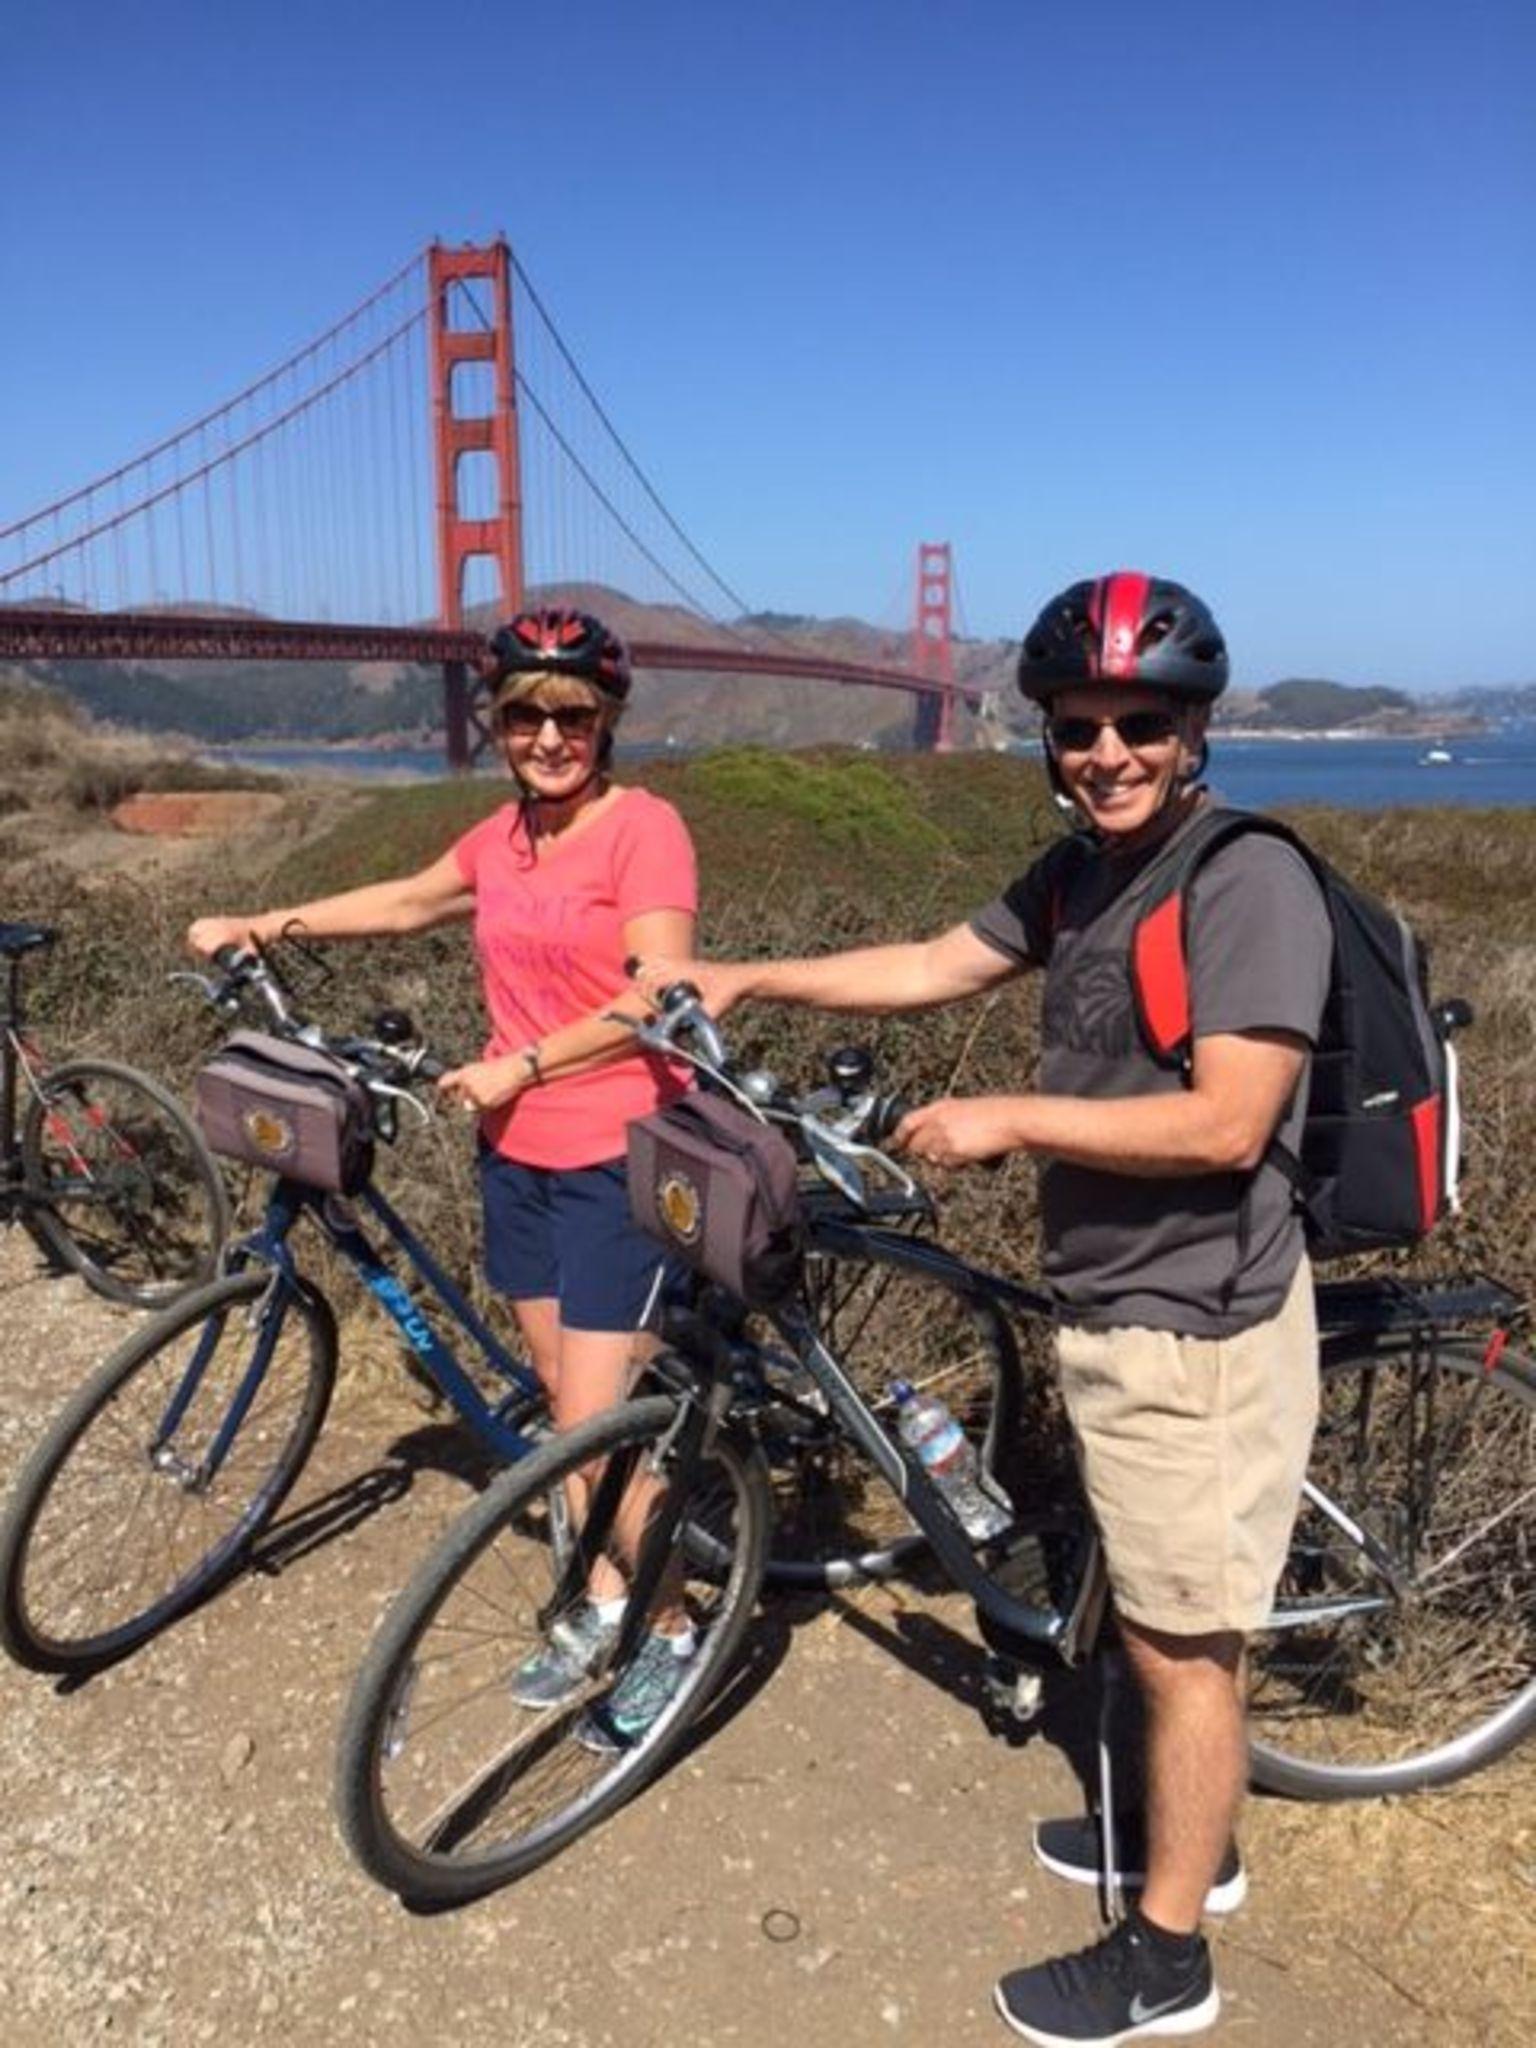 MÁS FOTOS, San Francisco Golden Gate Bridge to Sausalito Guided Bike Tour